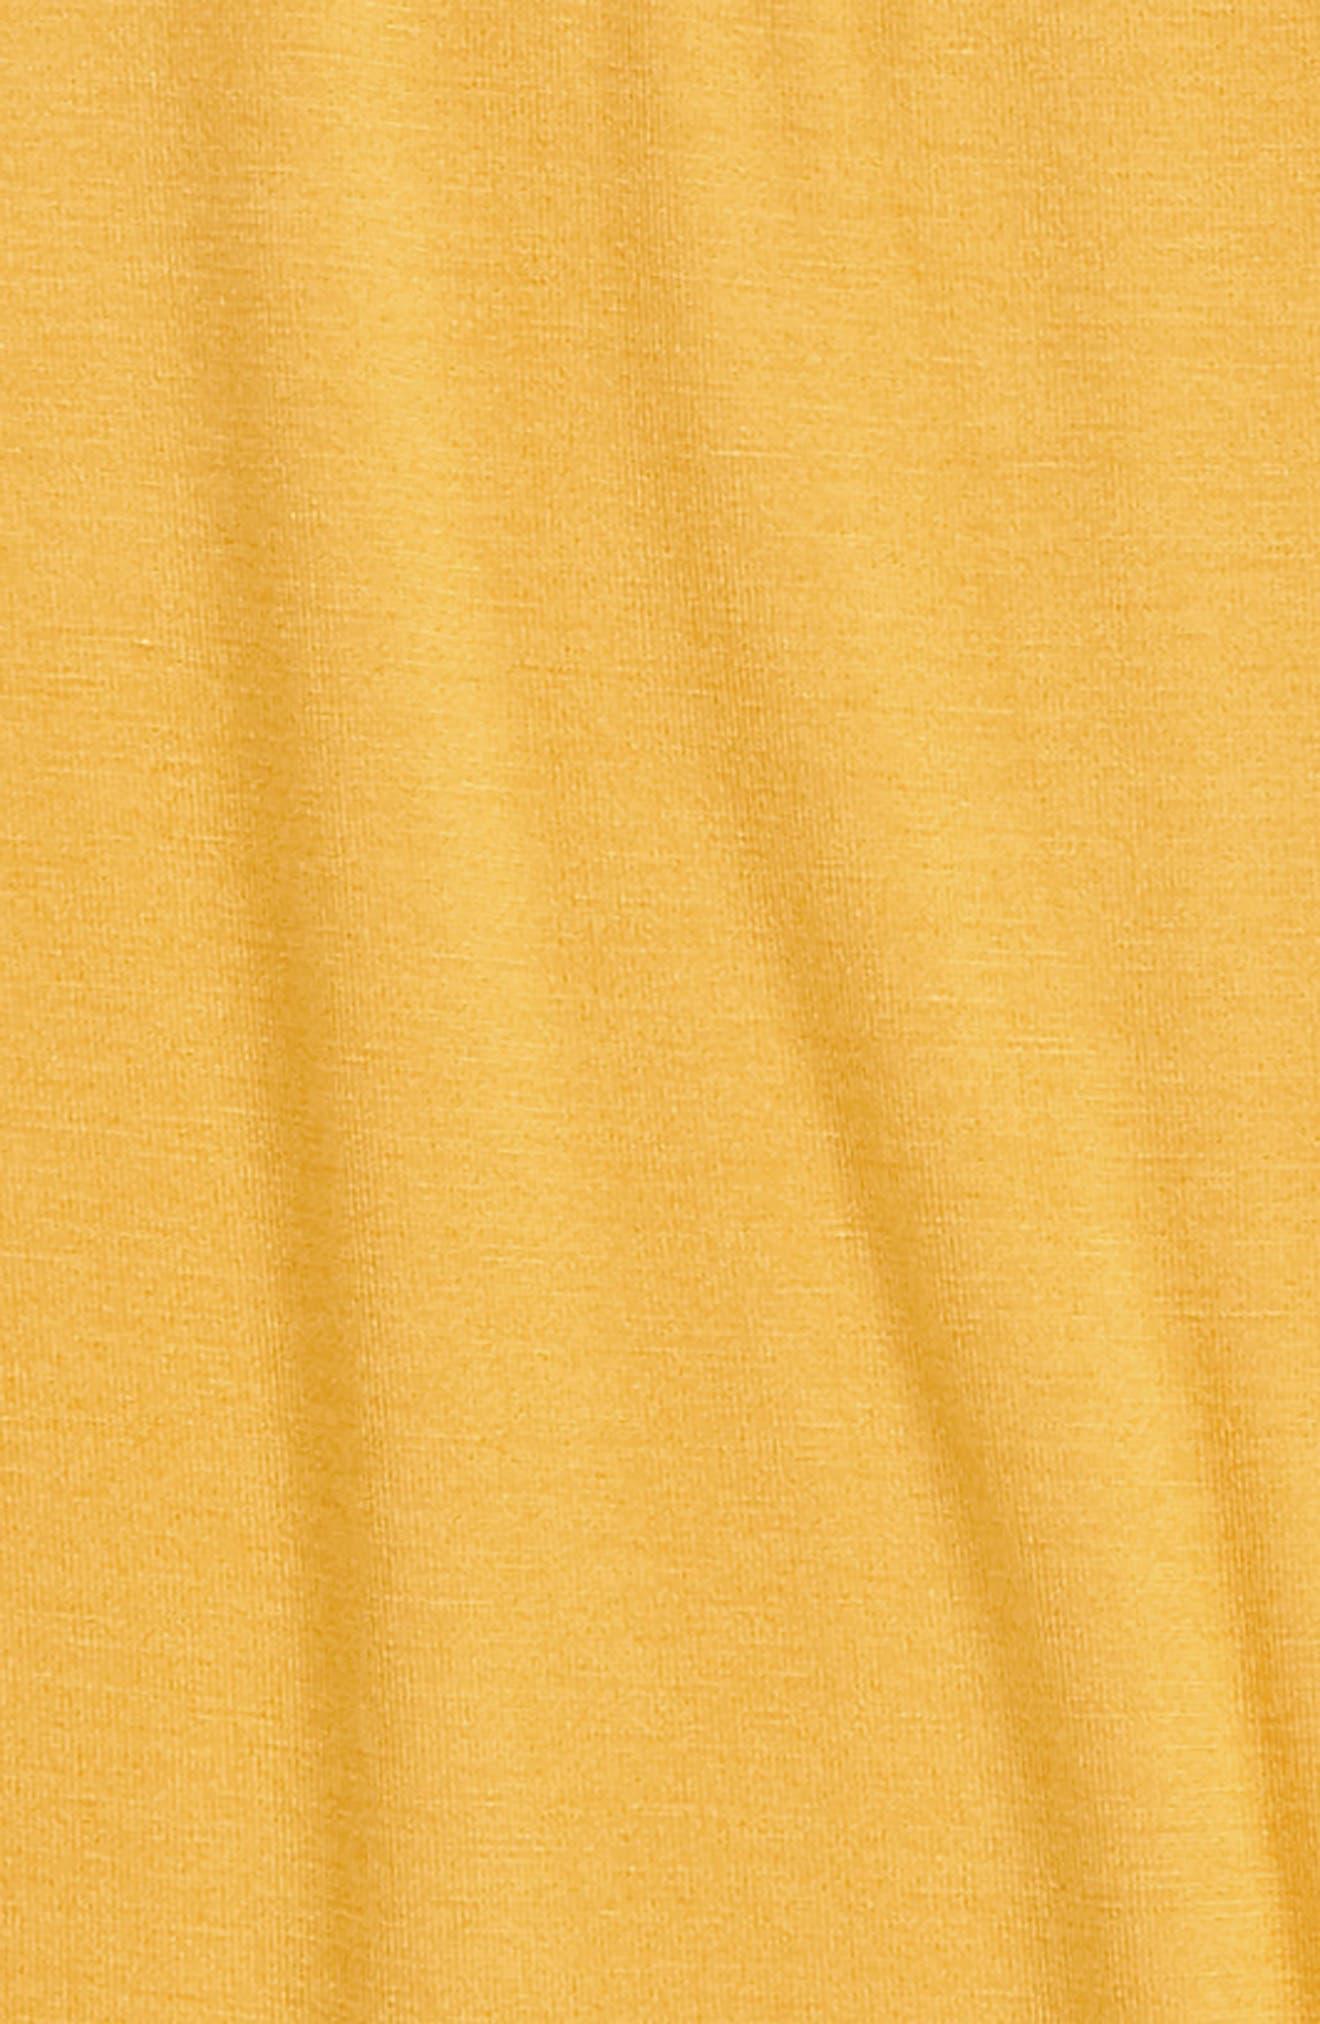 Tie Front Tee,                             Alternate thumbnail 2, color,                             MUSTARD